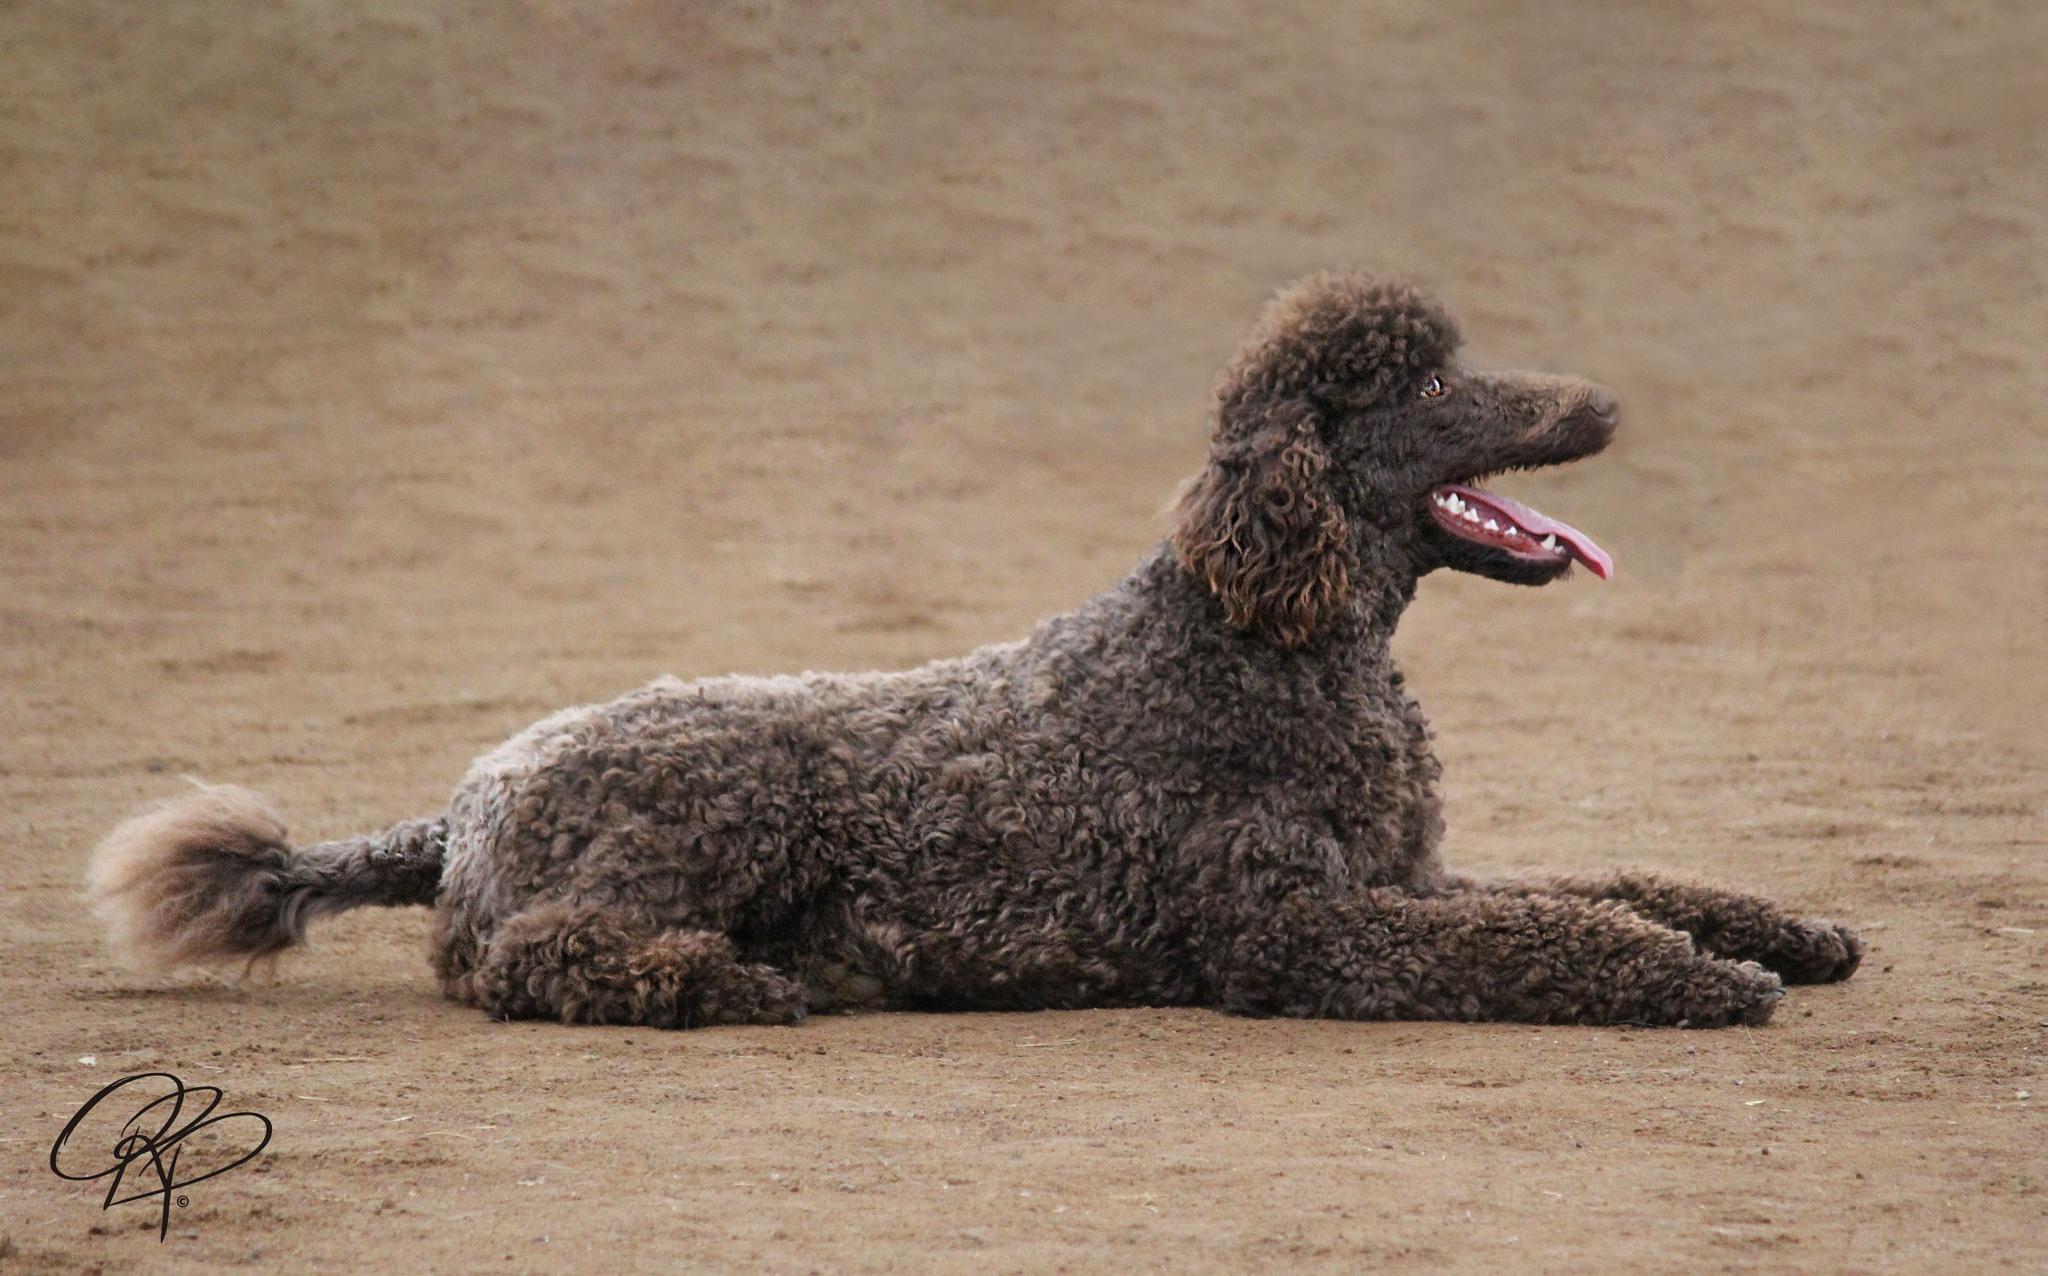 Poodle by ordinaryripple